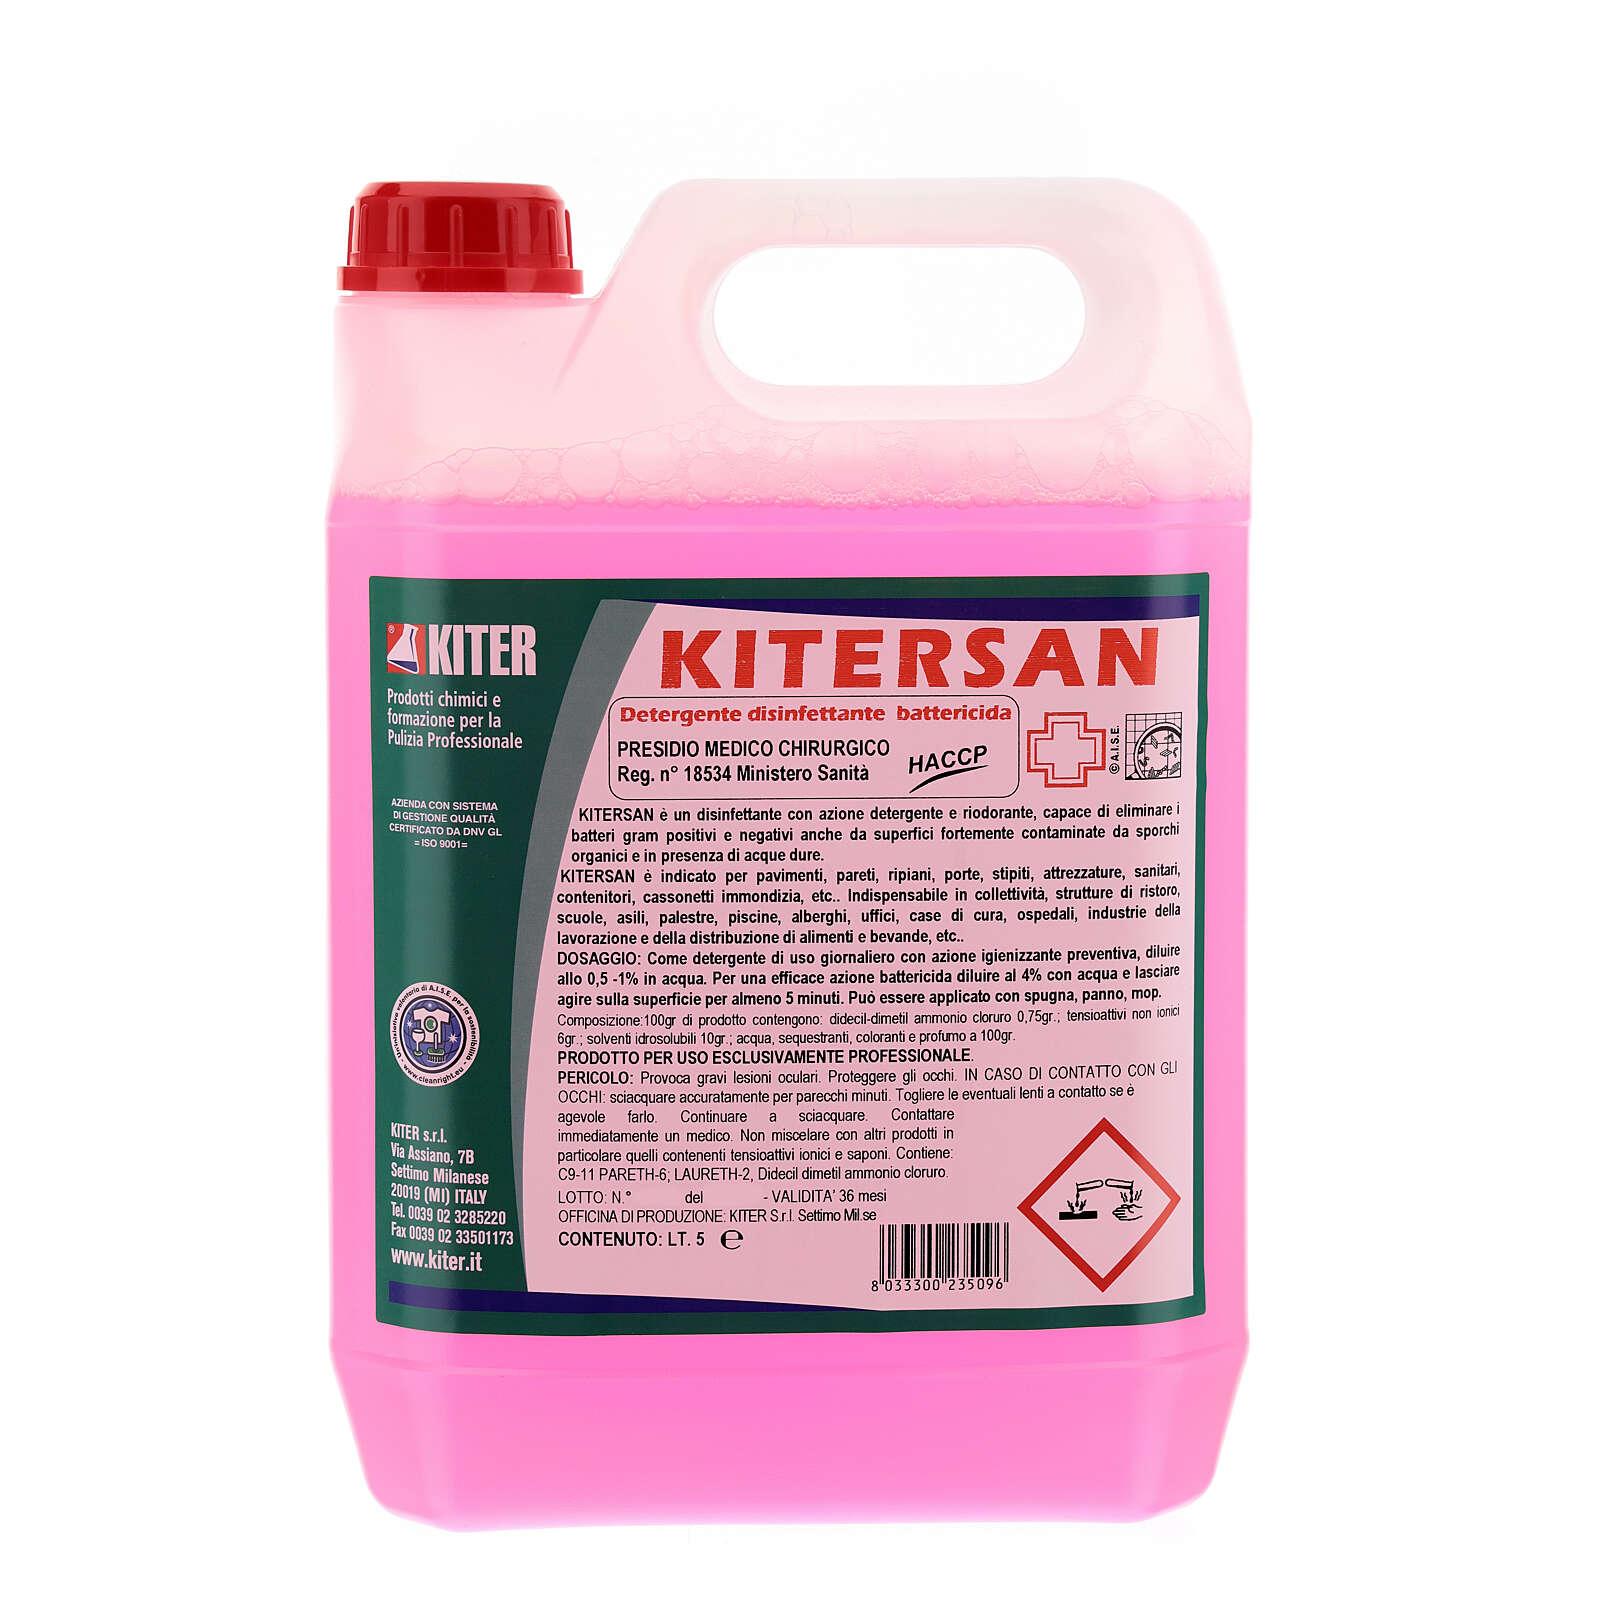 Kitersan detergente desinfectante bactericida 5 Litros 3